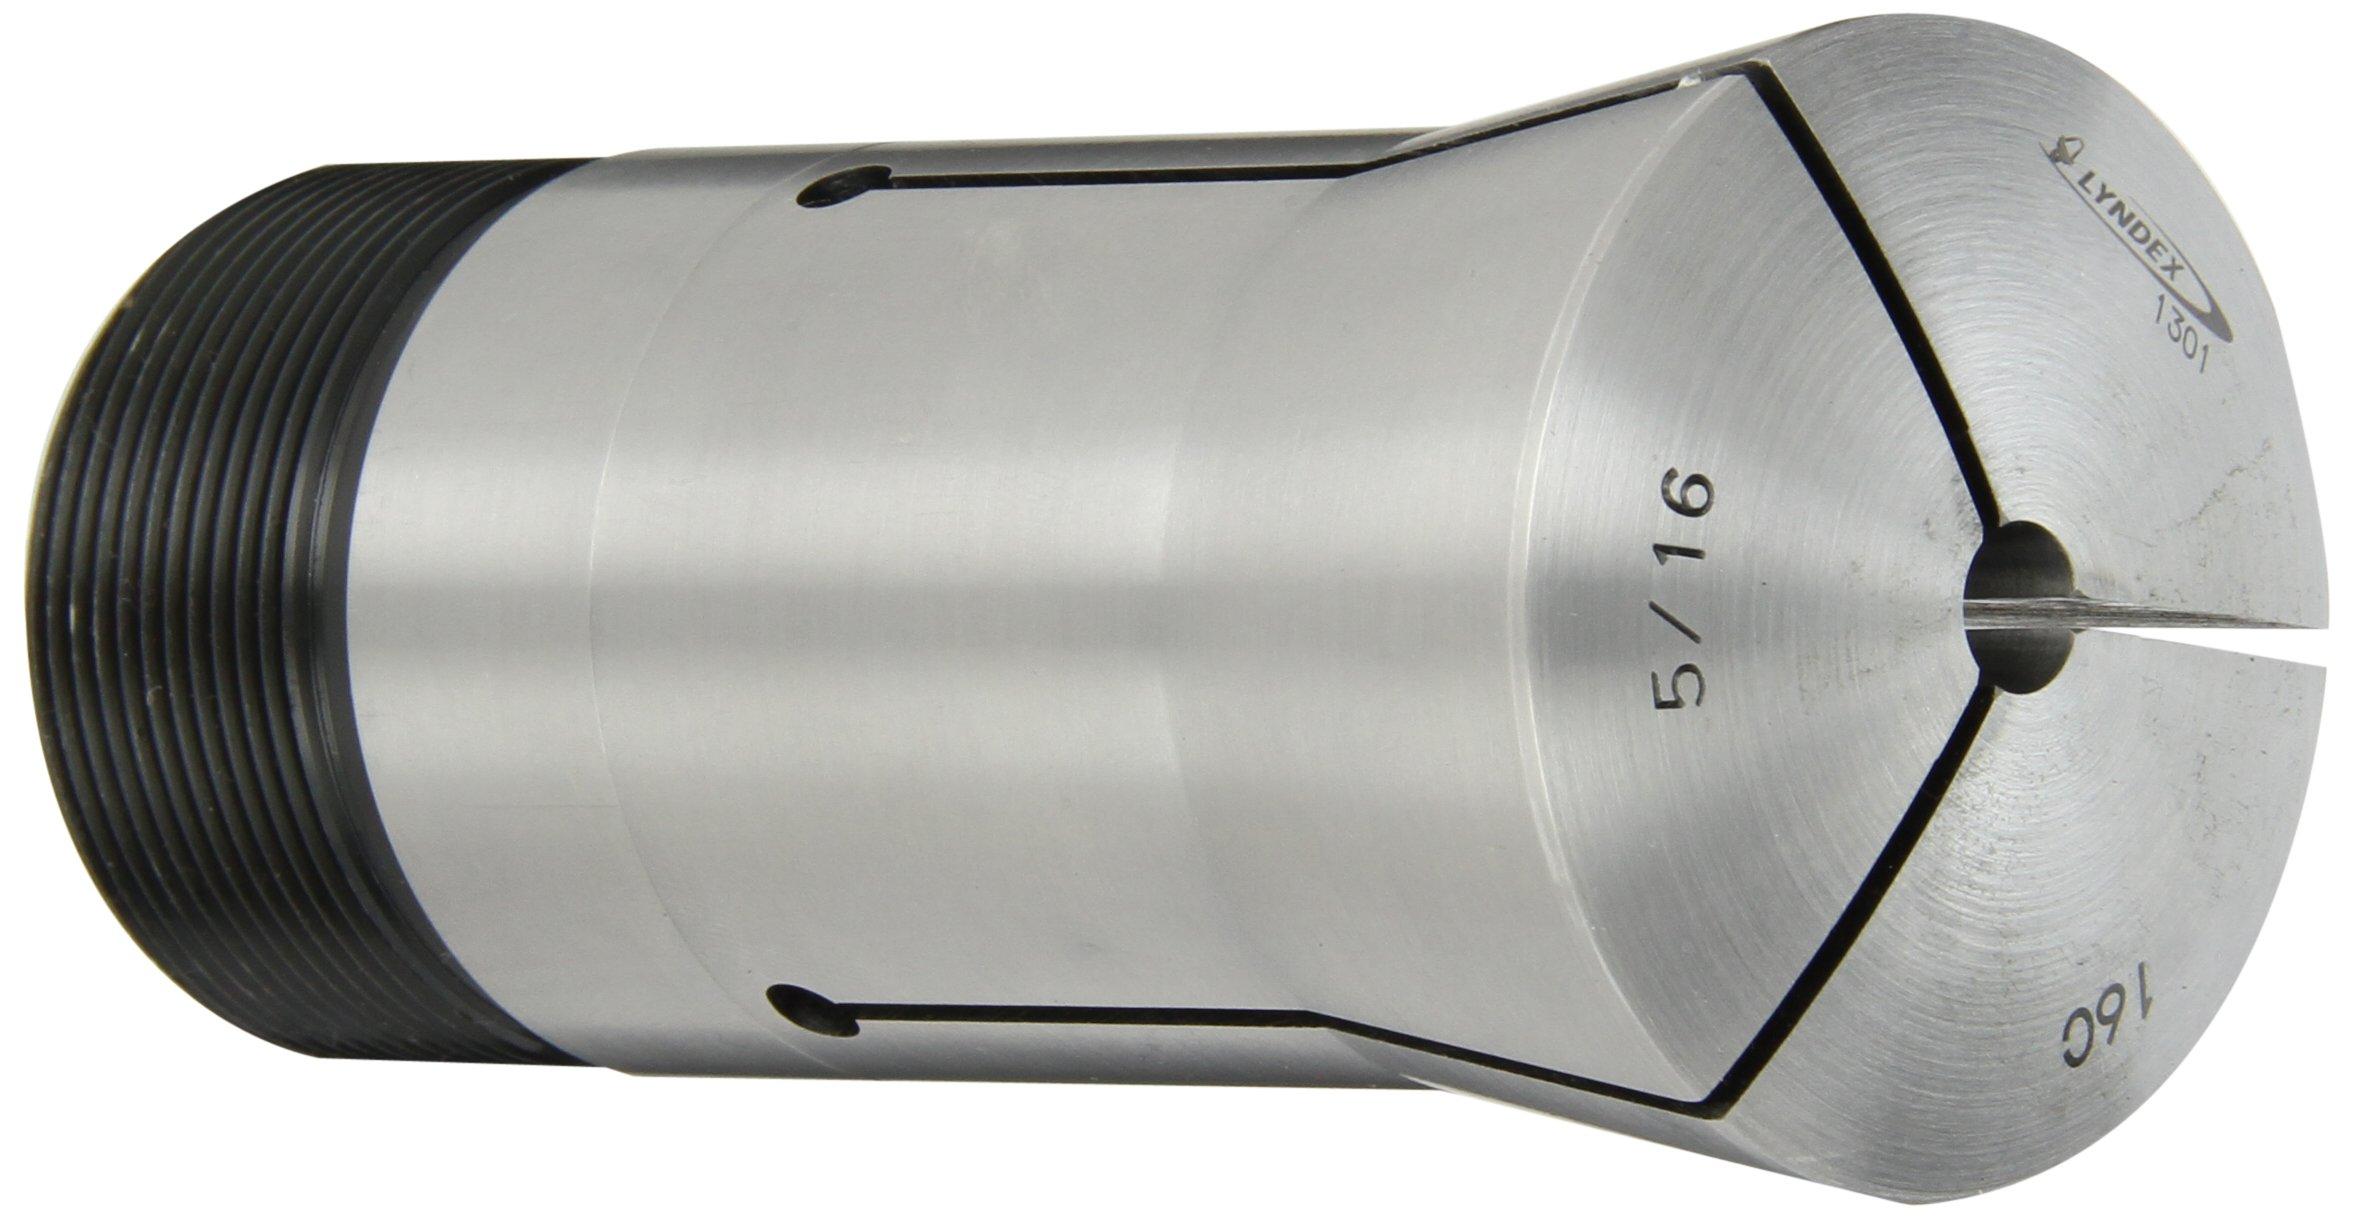 Lyndex 160-020 16C Round Collet, 5/16 Opening Size, 4.31'' Length, 2.26'' Top Diameter, 1.89'' Bottom Diameter